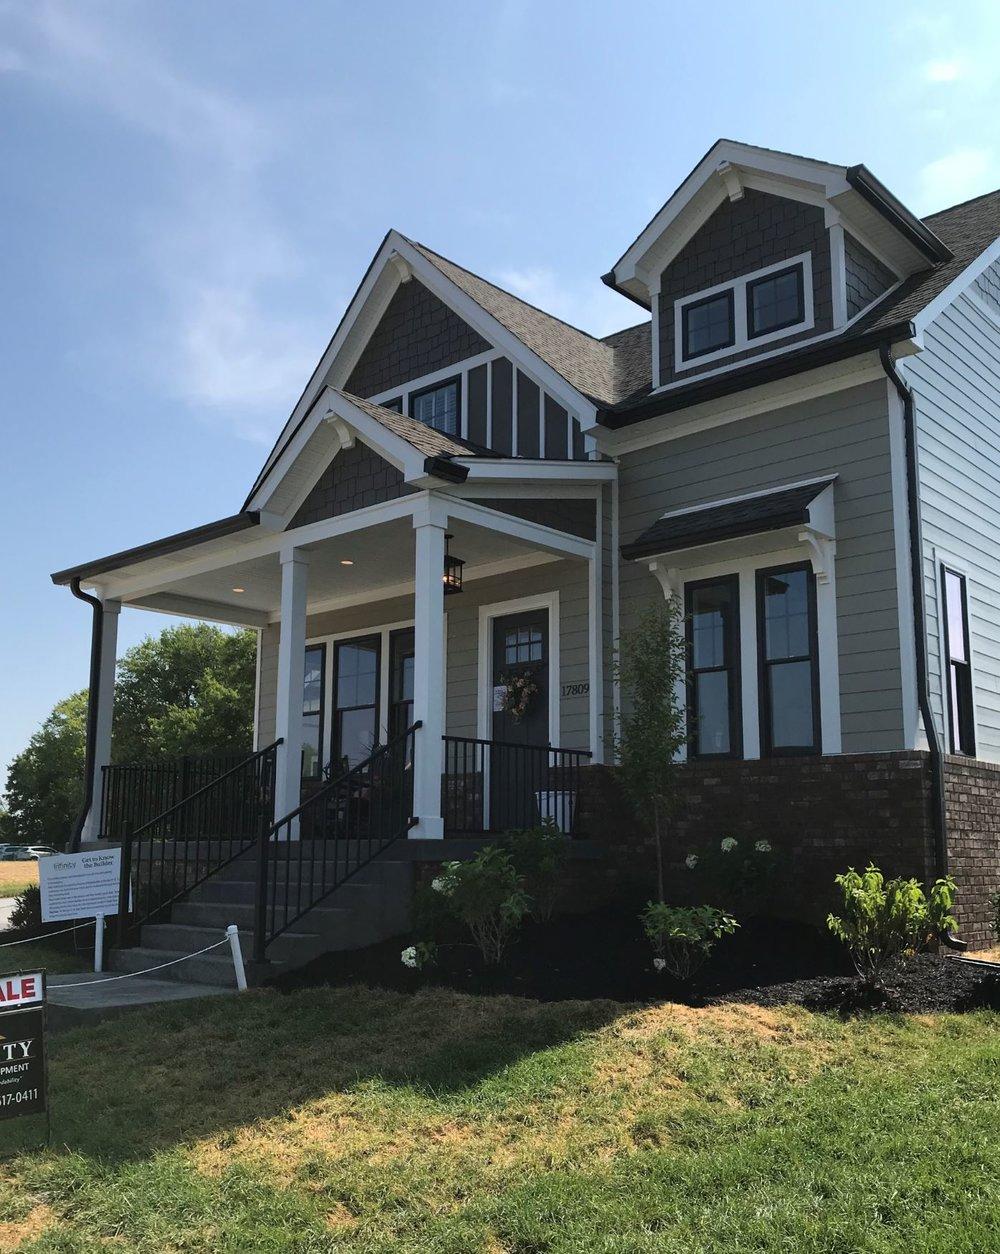 7 exterior house paint ideas kentucky.JPG